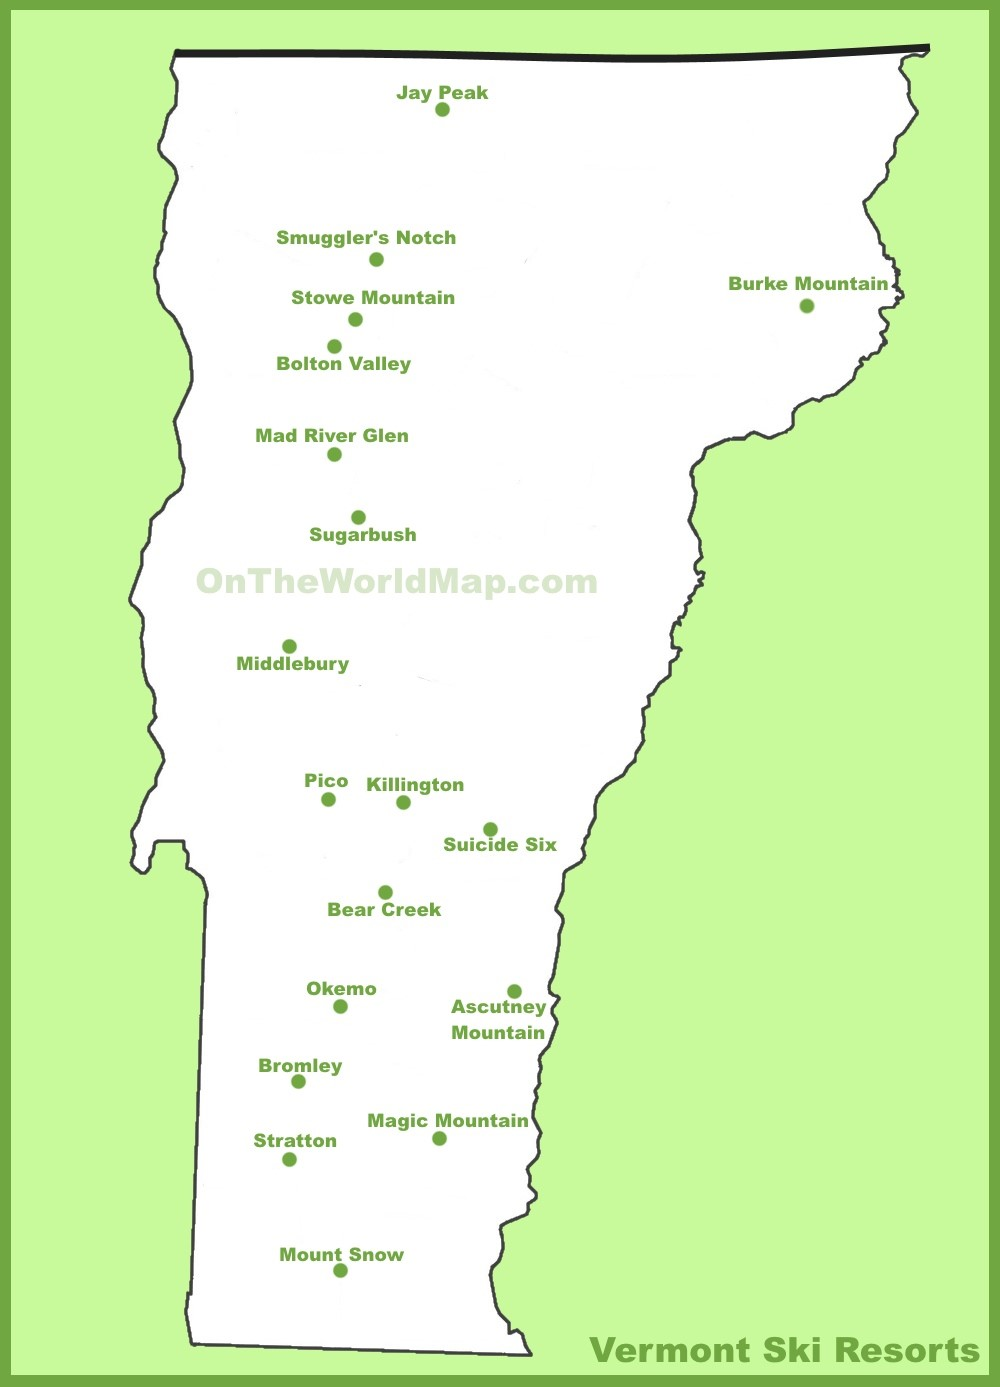 Vermont Ski Resorts Map Map of Vermont ski resorts